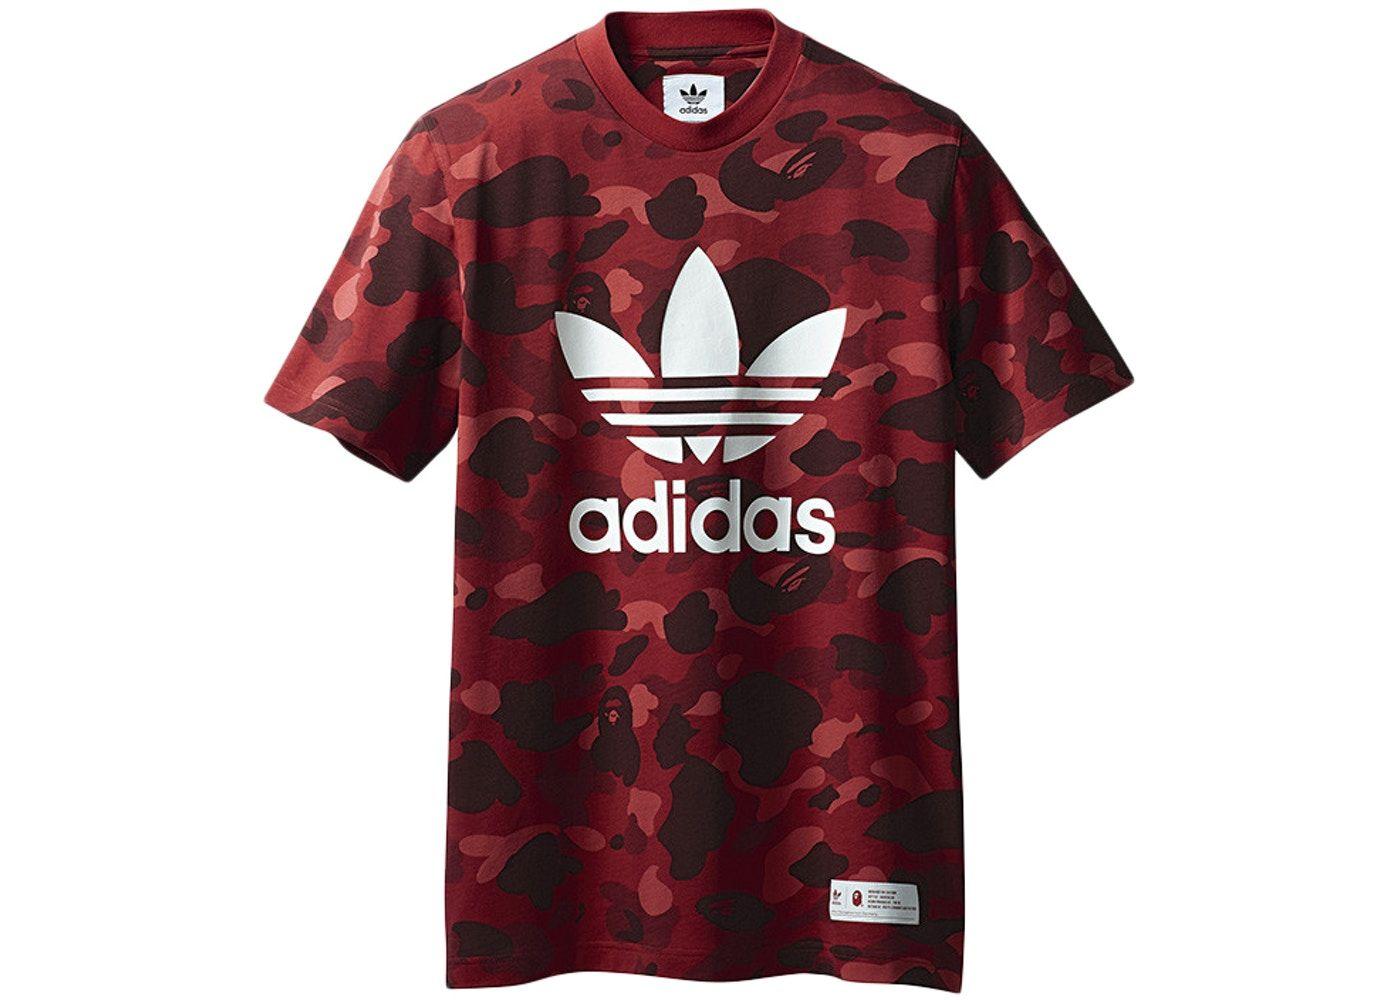 8f64f6df BAPE x adidas adicolor Tee Raw Red in 2019   shose   Bape, Adidas ...